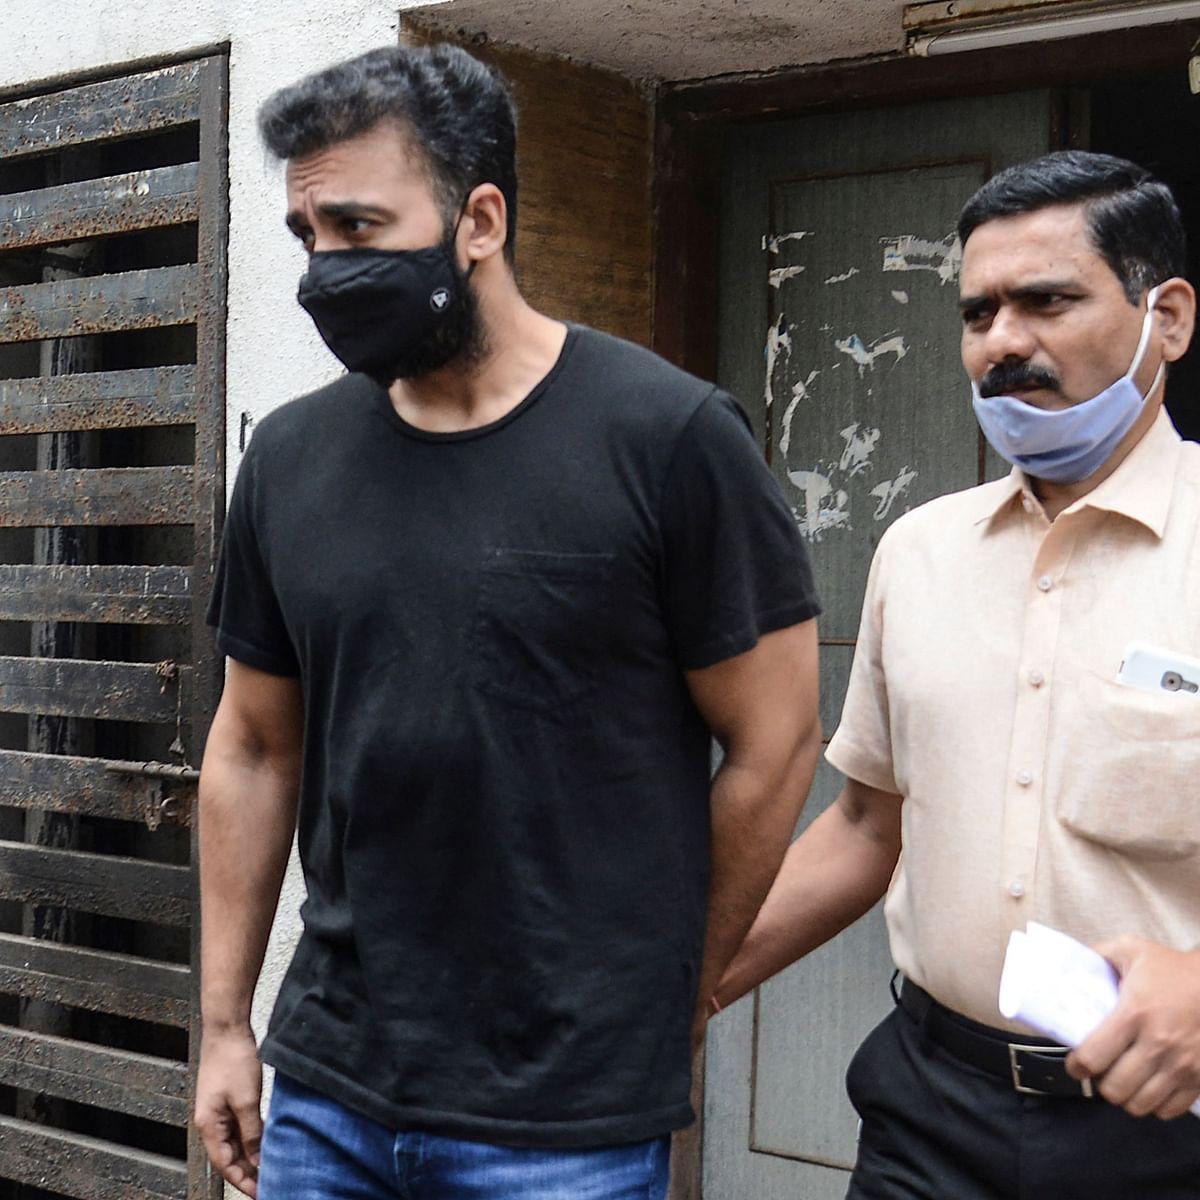 Pornography case: Mumbai court to hear bail plea of Raj Kundra, Ryan Thorpe today